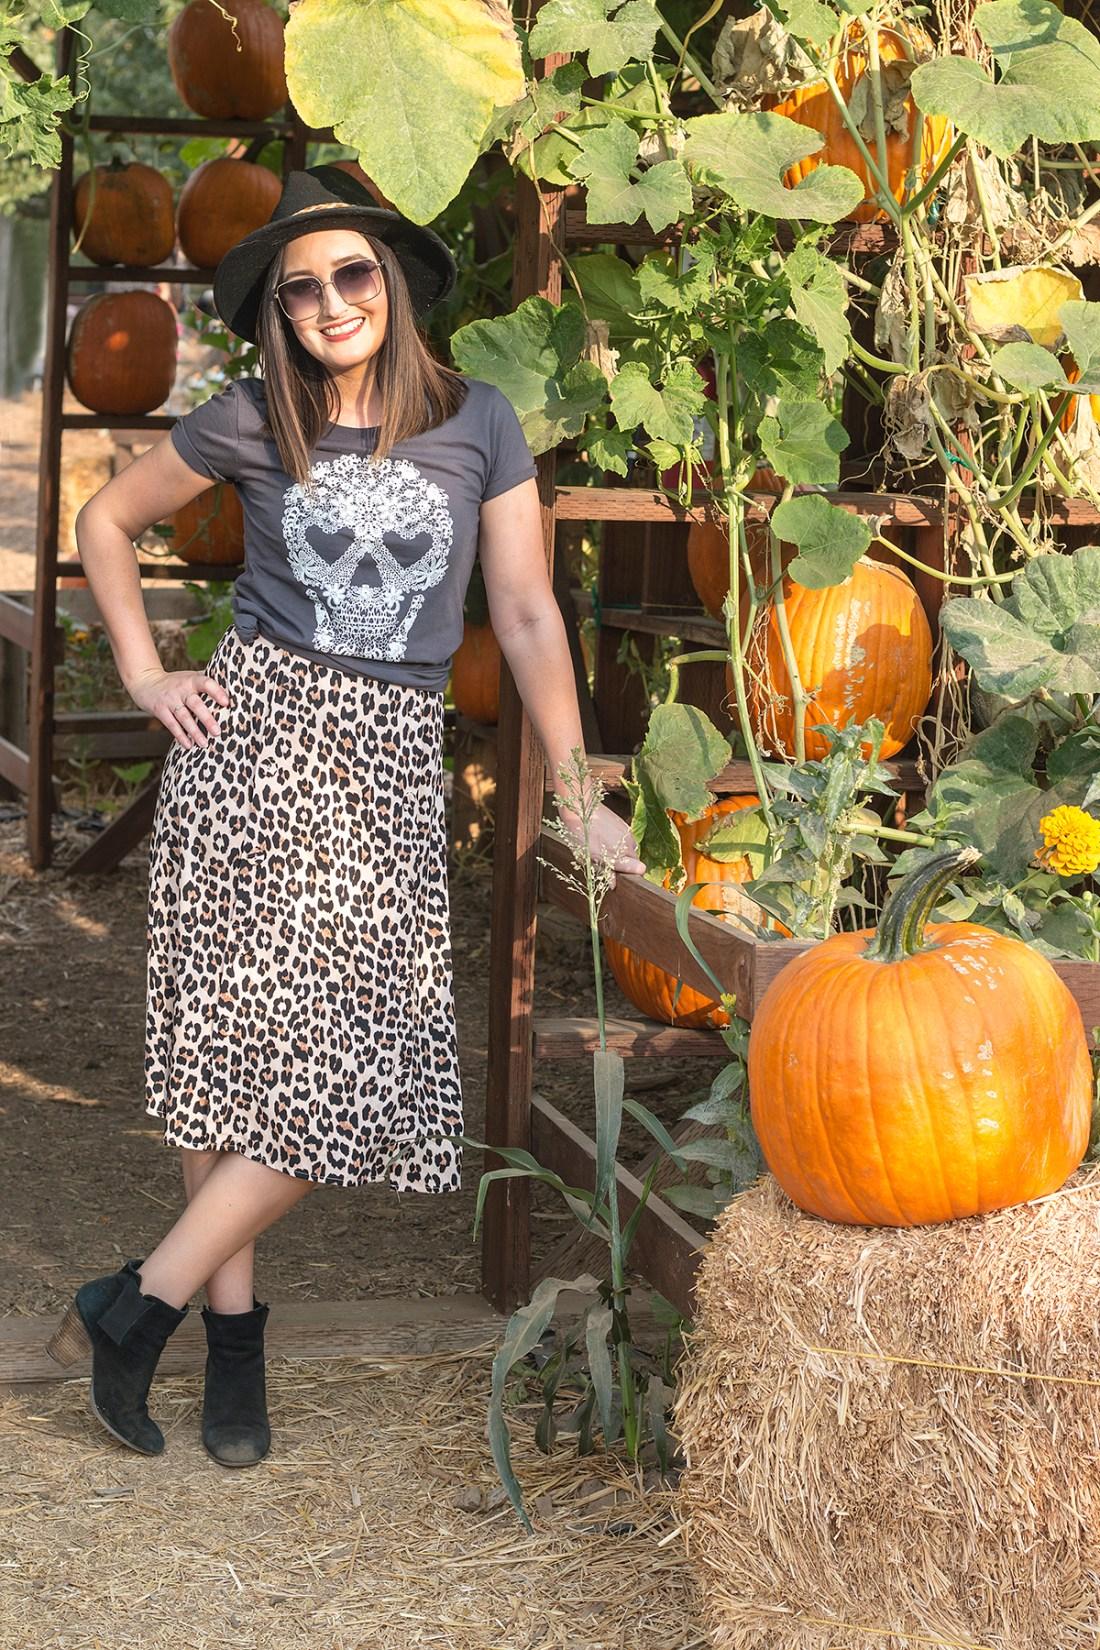 Pumpkin Patch Fall Outfit | A Good Hue